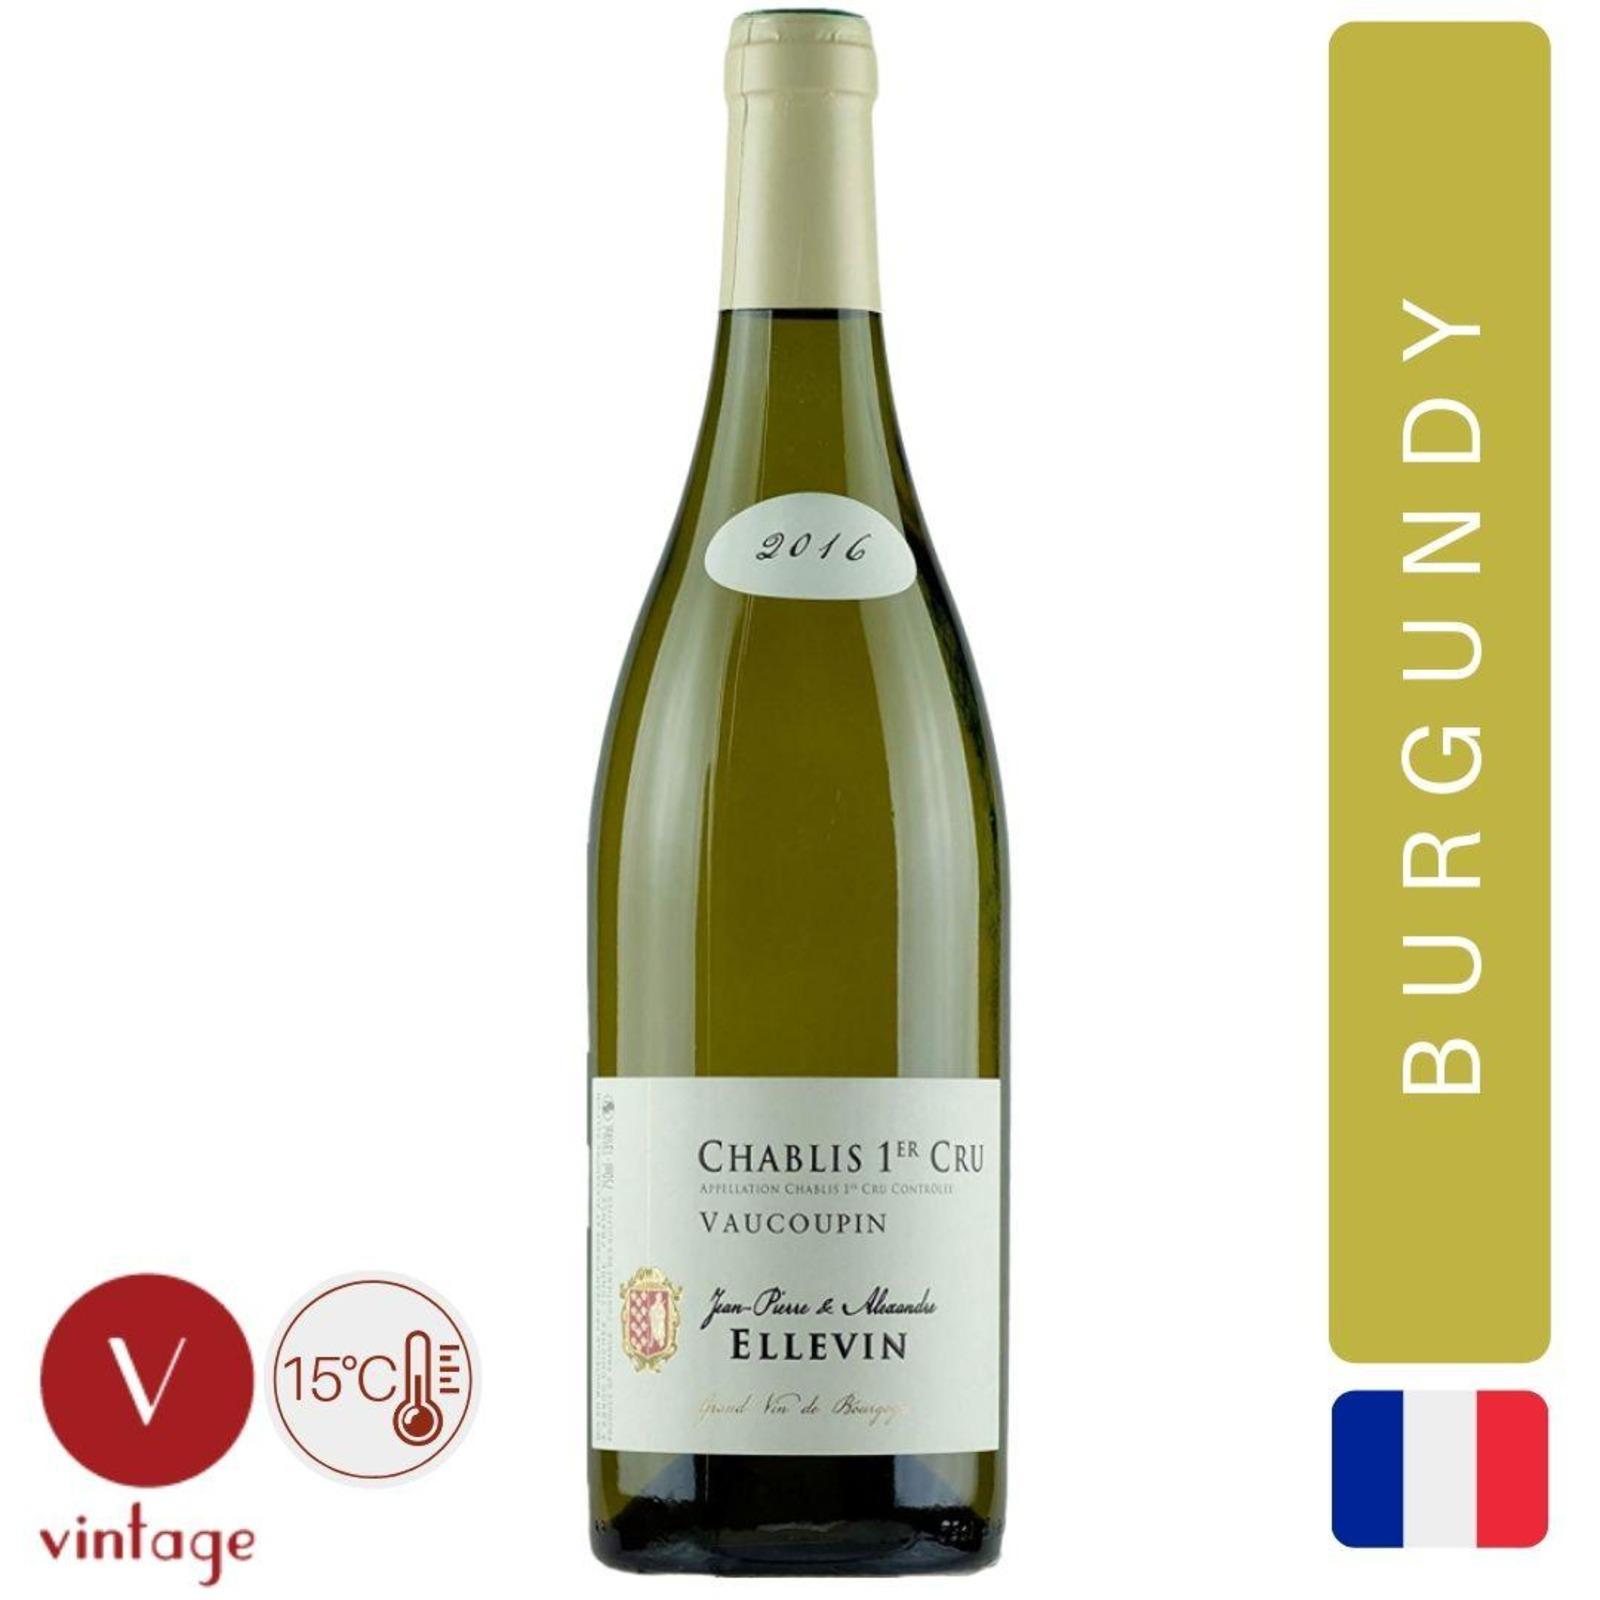 Domaine Ellevin - Chablis 1er Cru Vaucoupin - Burgundy White